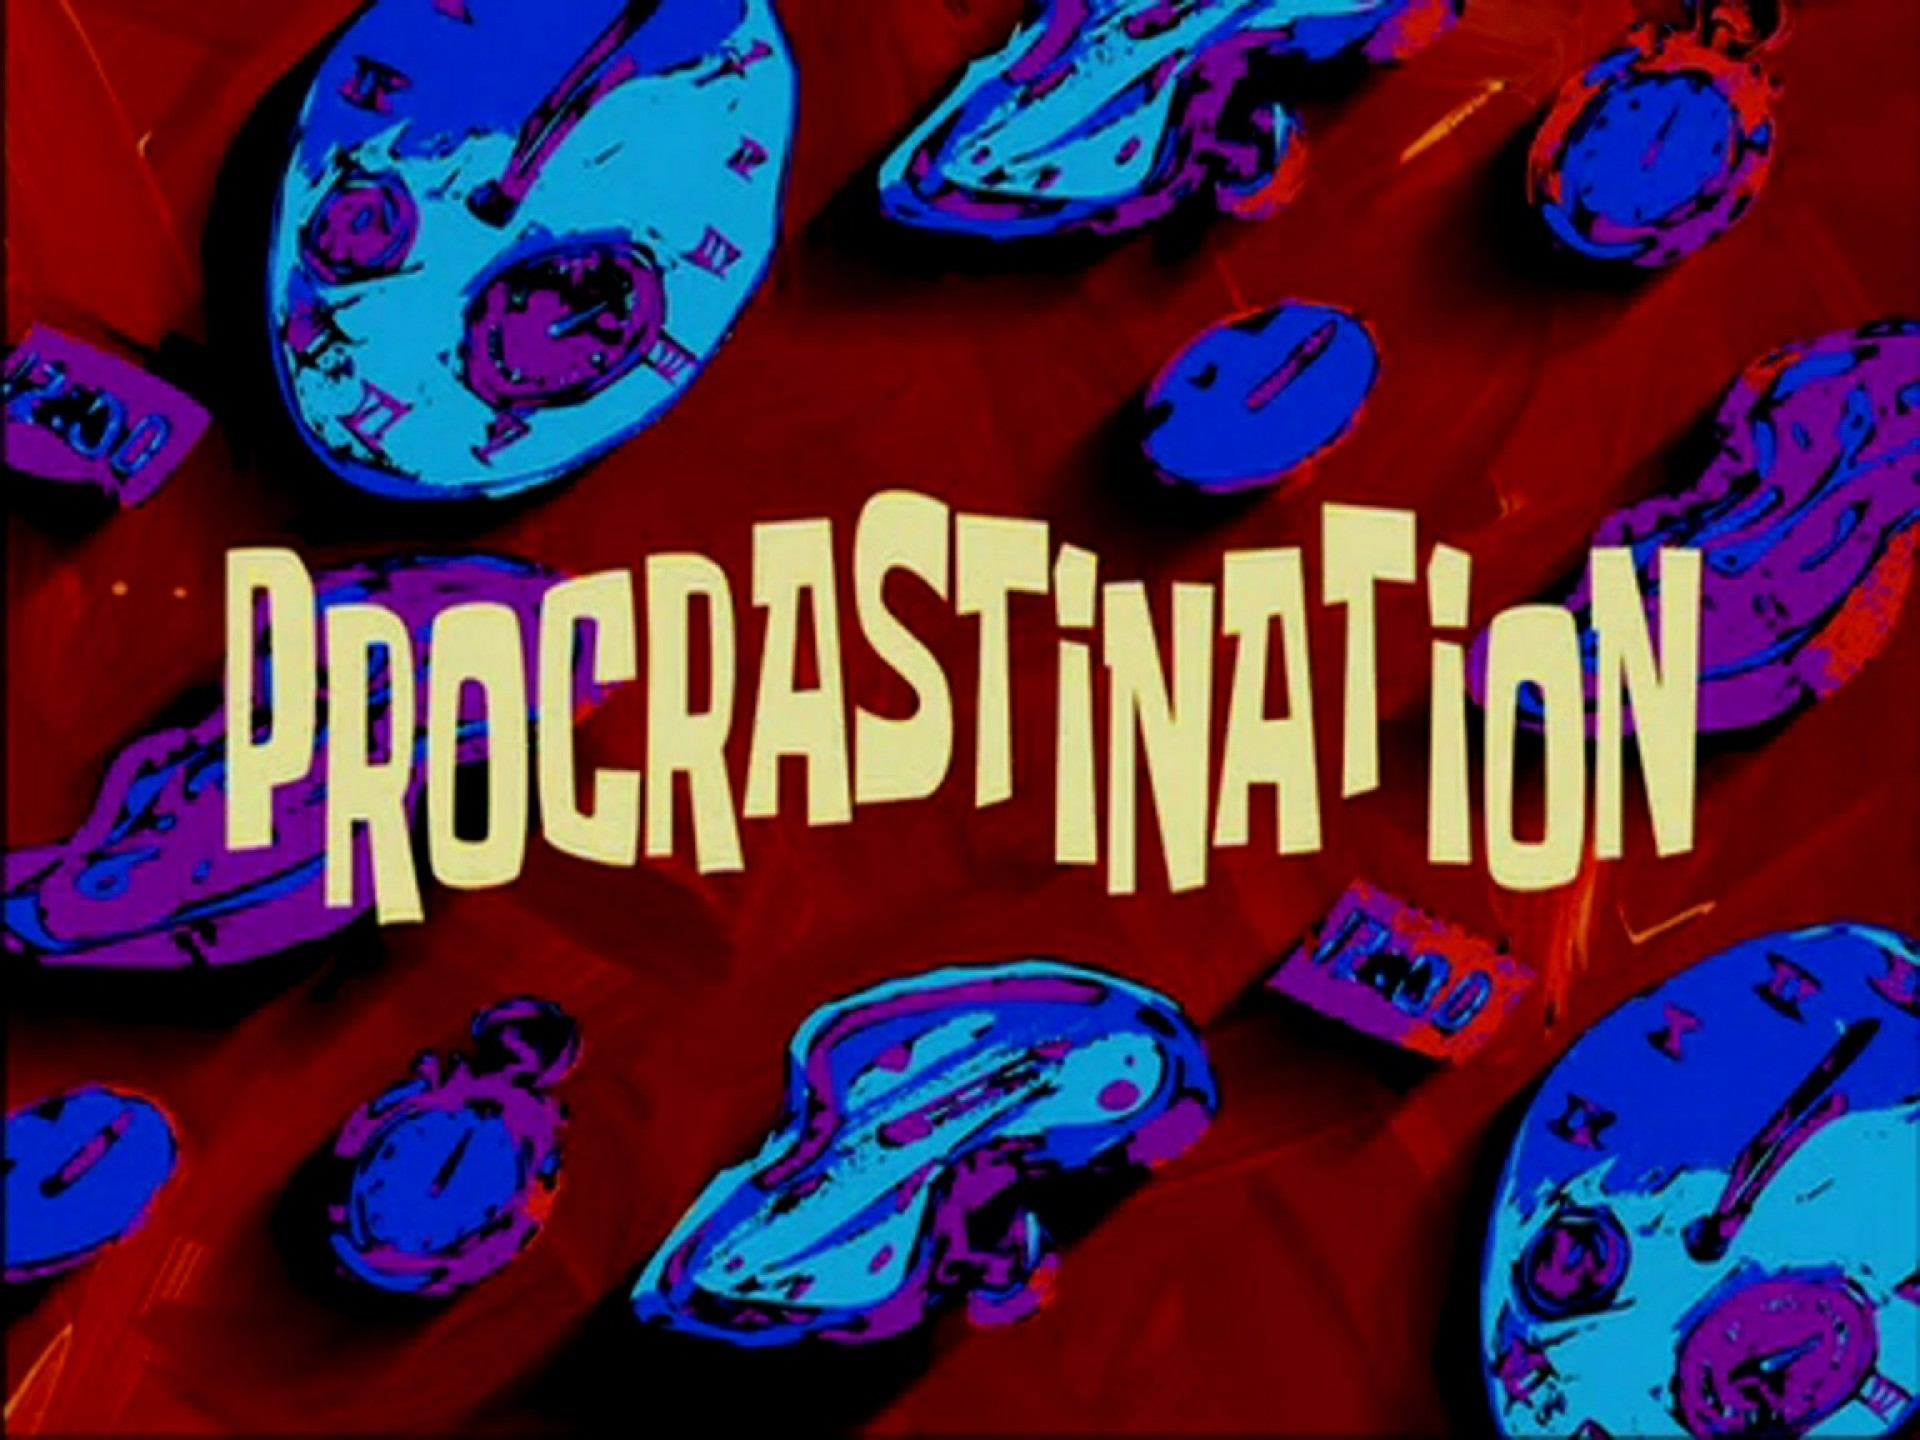 016 Spongebob Essay The Example Unforgettable Font Copy And Paste Gif Meme 1920